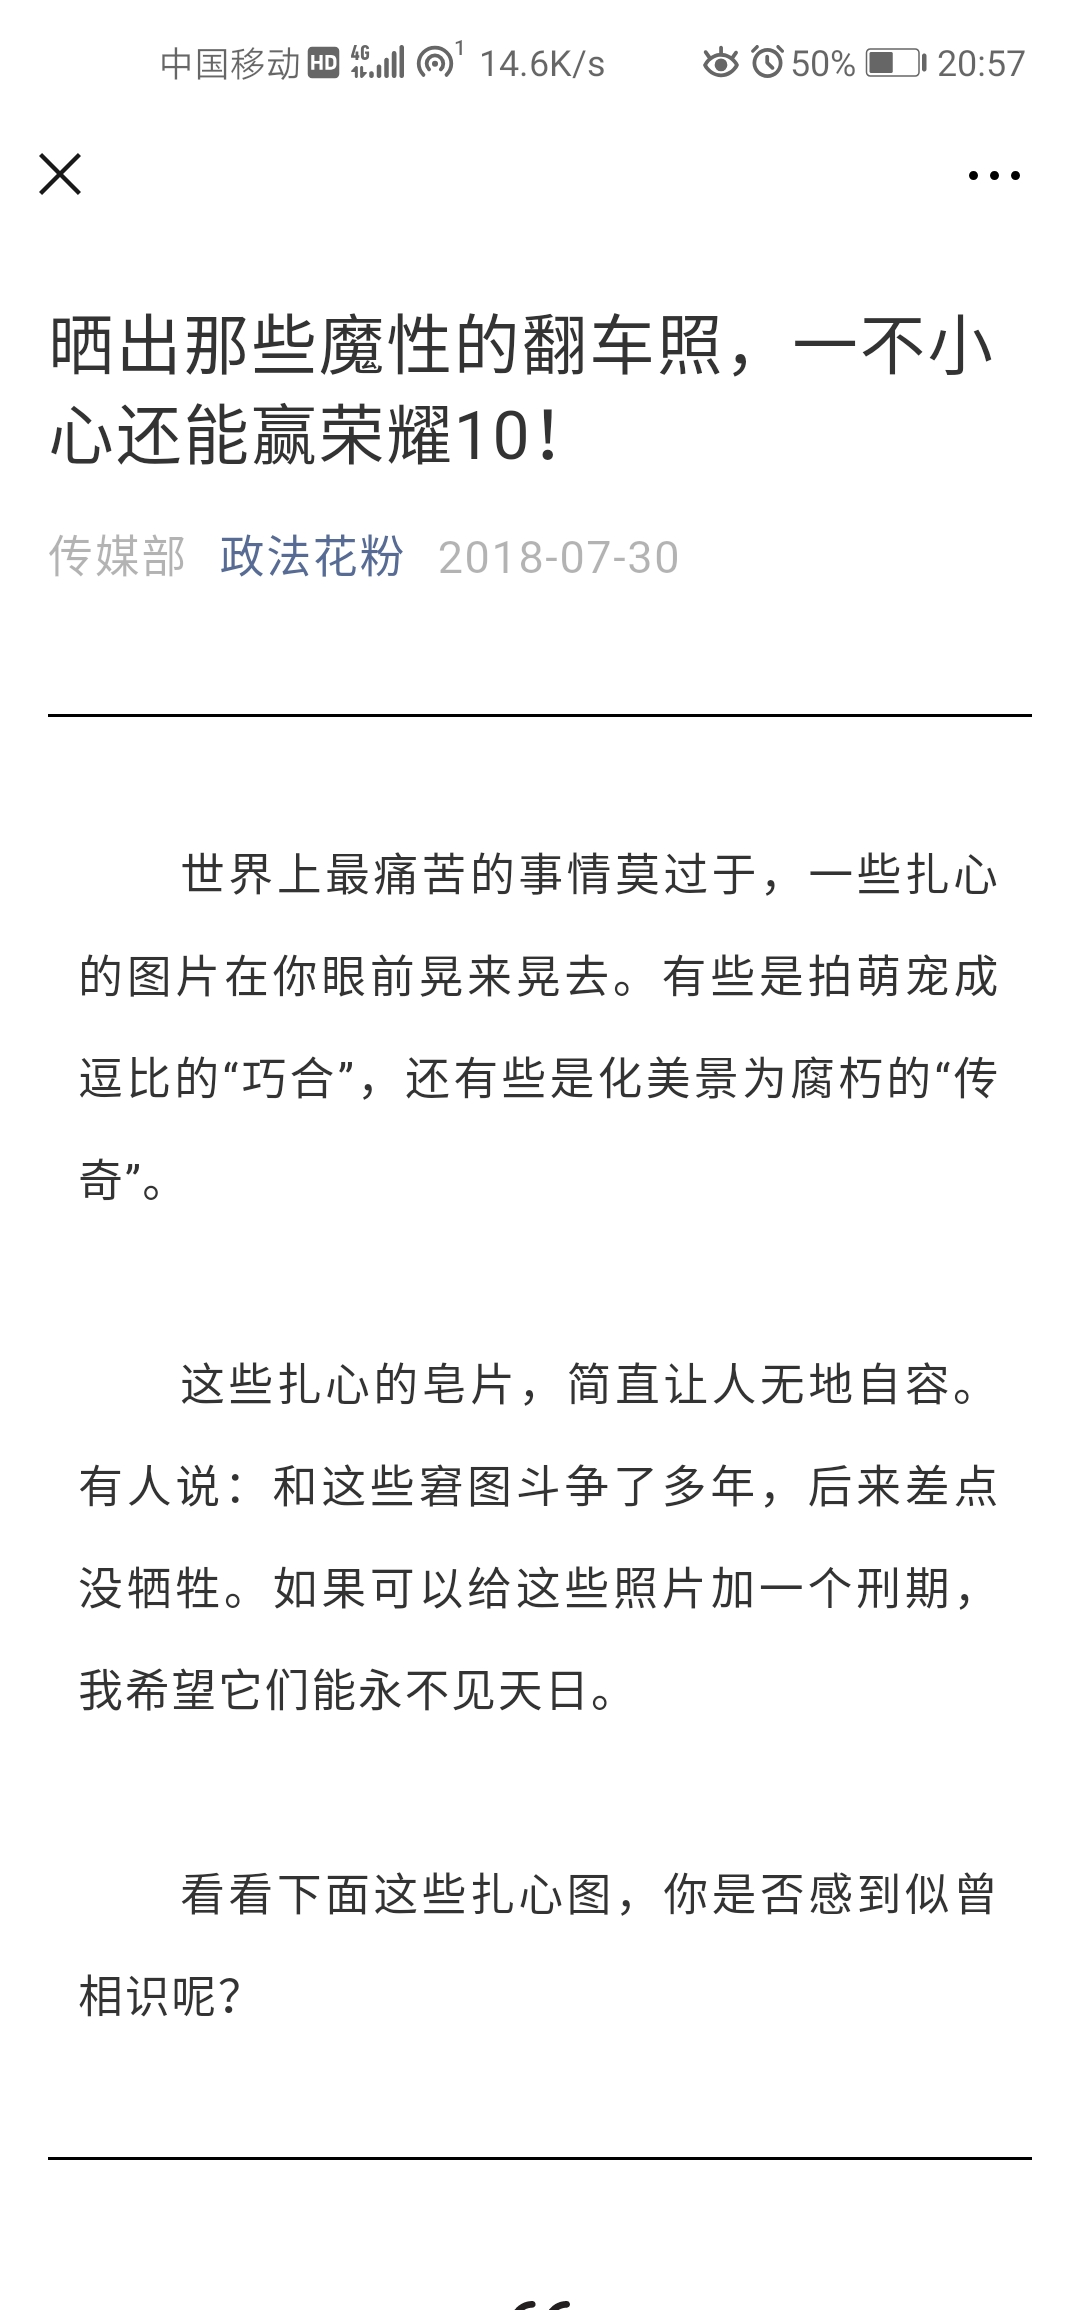 Screenshot_20190210_205711_com.tencent.mm.jpg